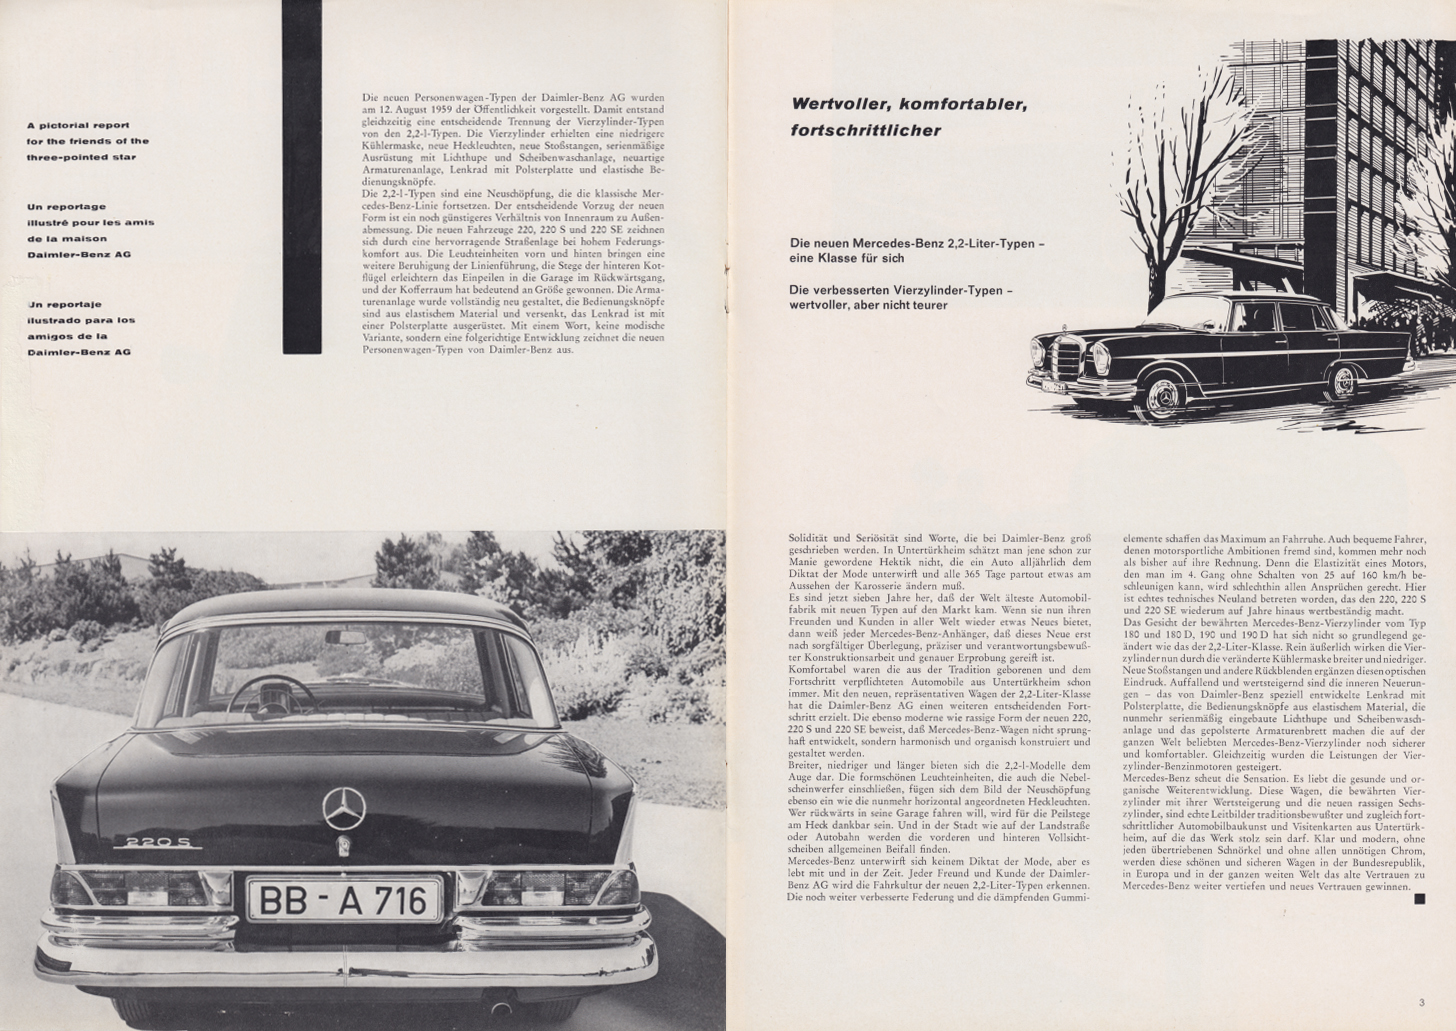 (REVISTA): Periódico In aller welt n.º 34 - Mercedes-Benz no mundo - 1959 - multilingue 002